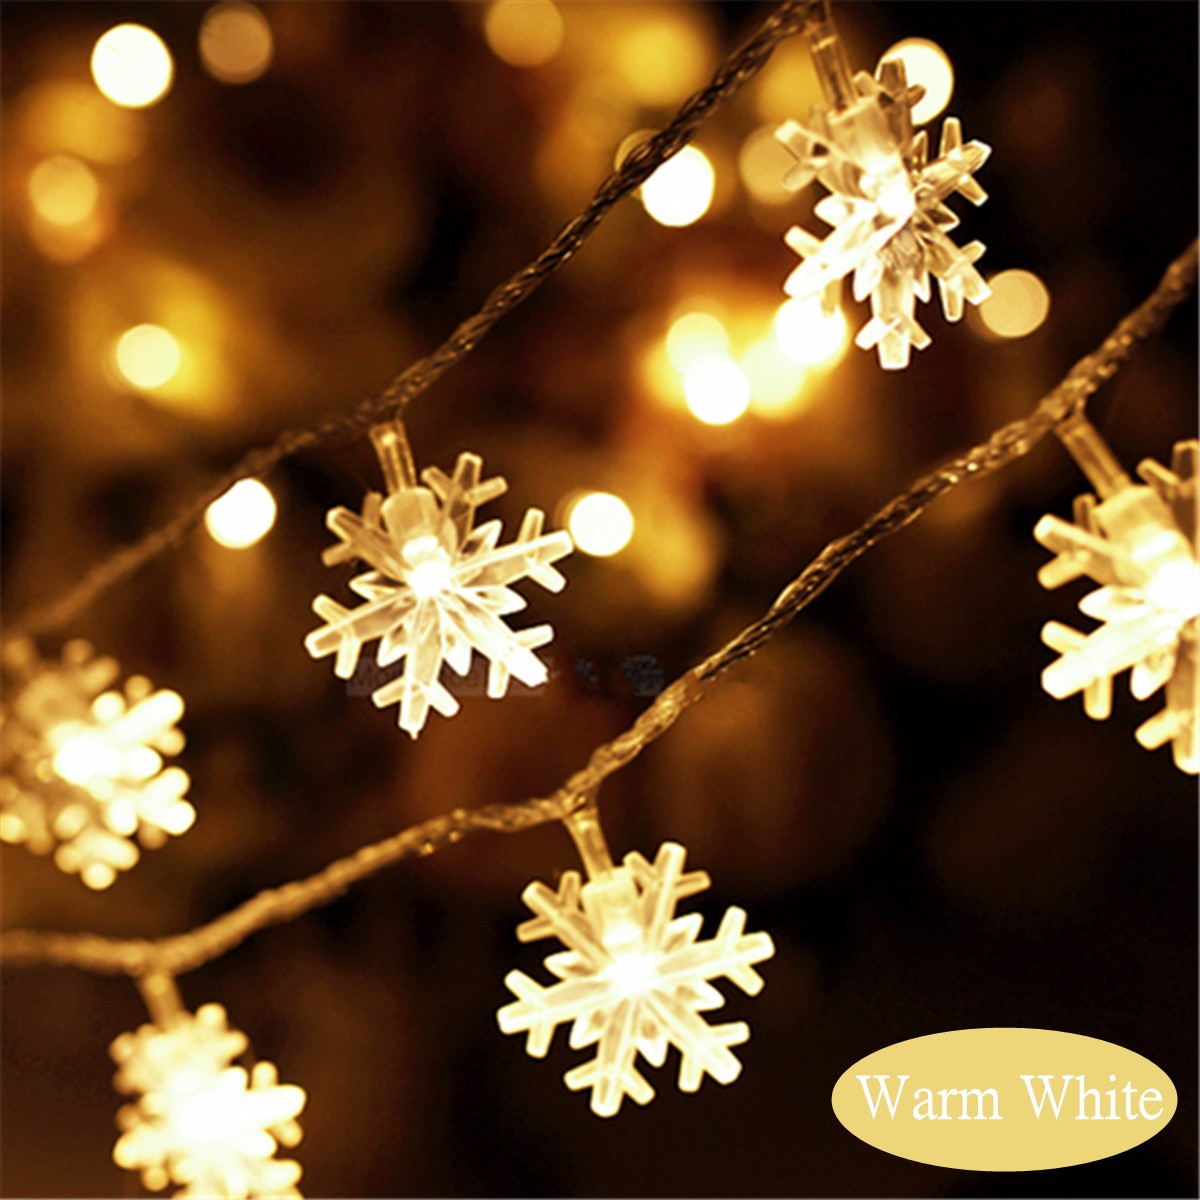 2.5M/5M LED Snowflakes String Christmas Light Xmas Tree Ornament Garland Hanging Decor Alex NLD